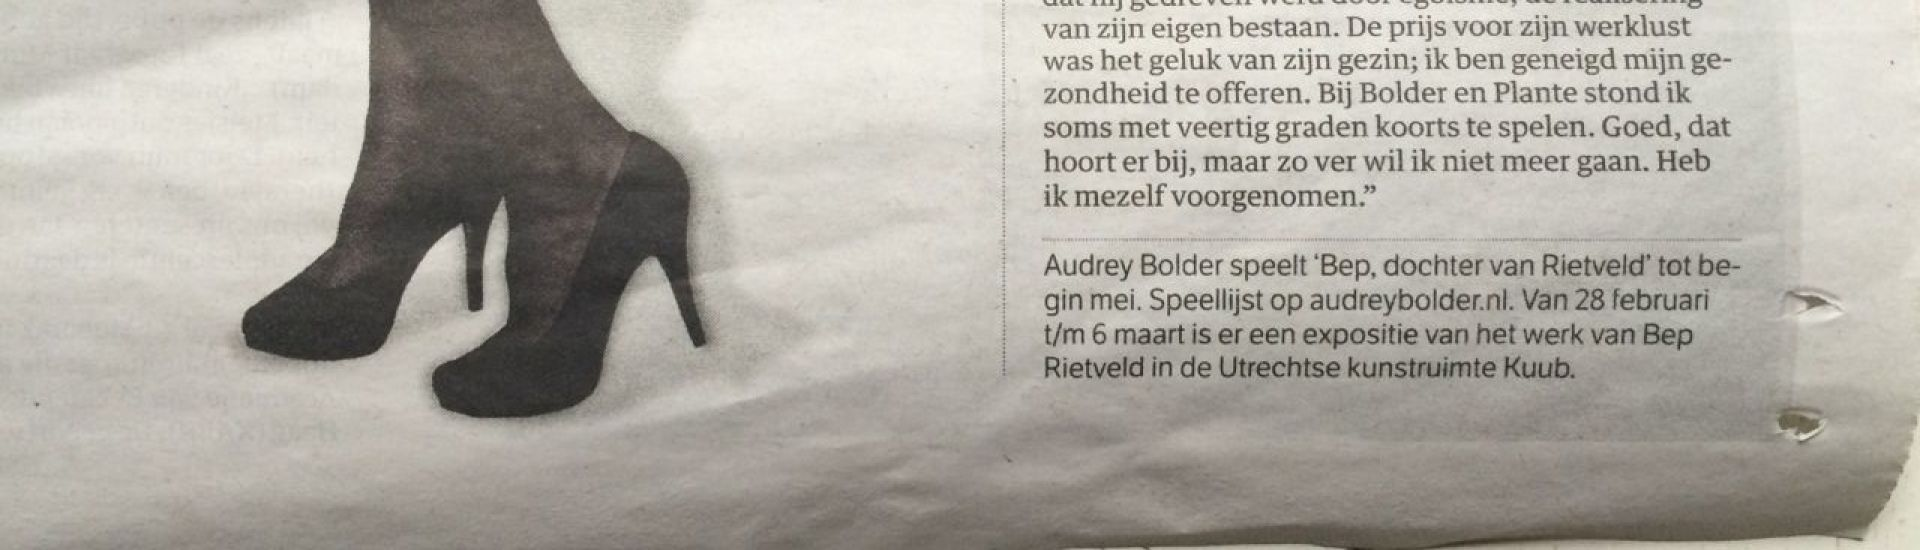 Audrey Bolder